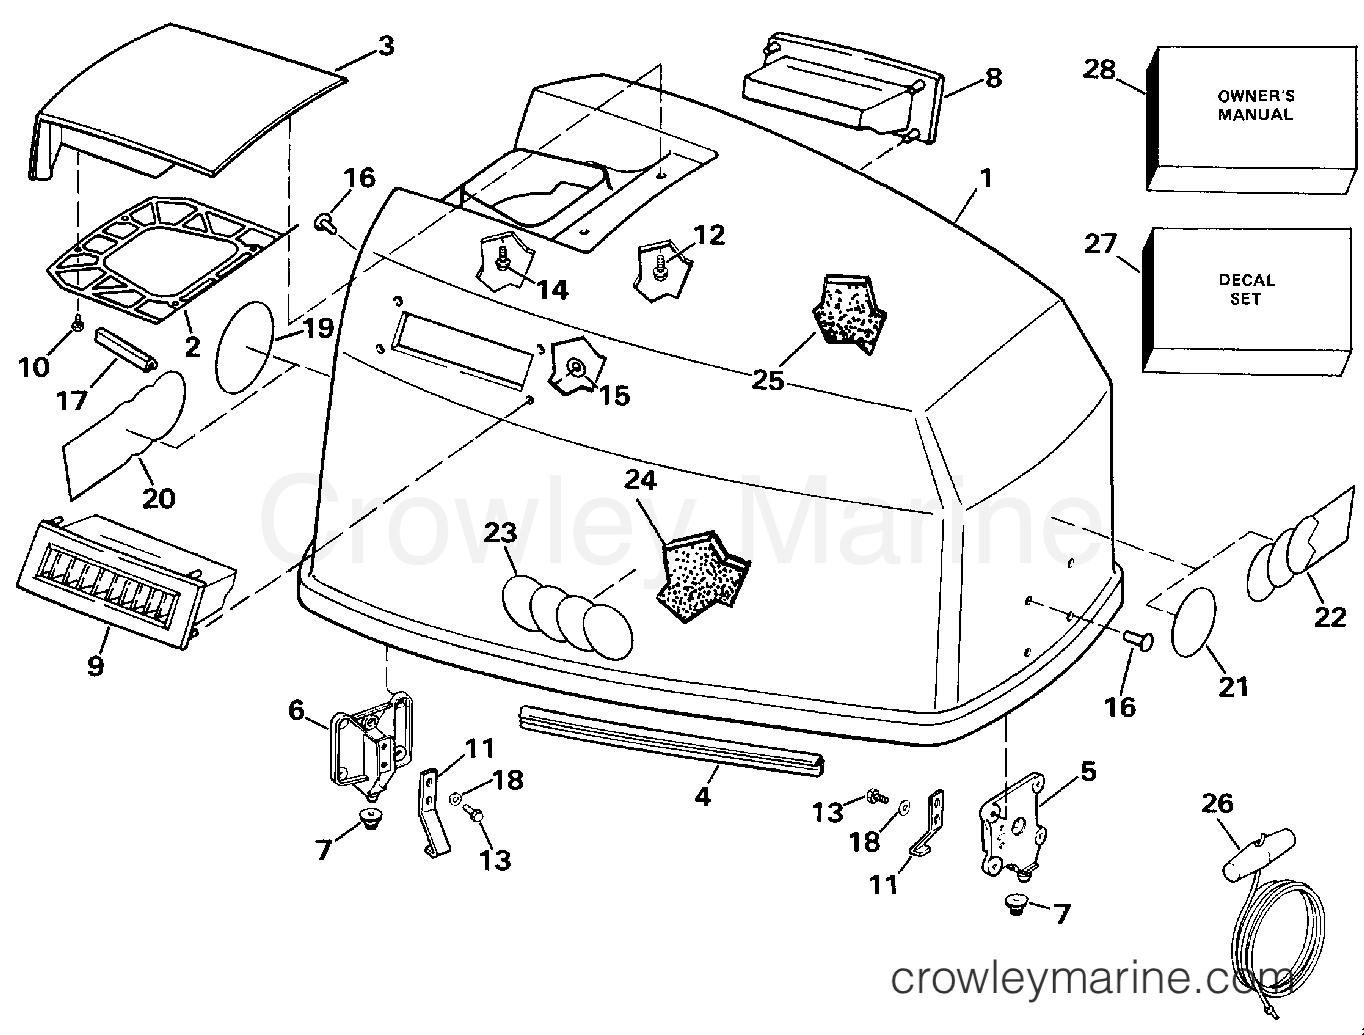 125 Evinrude Outboard Motor